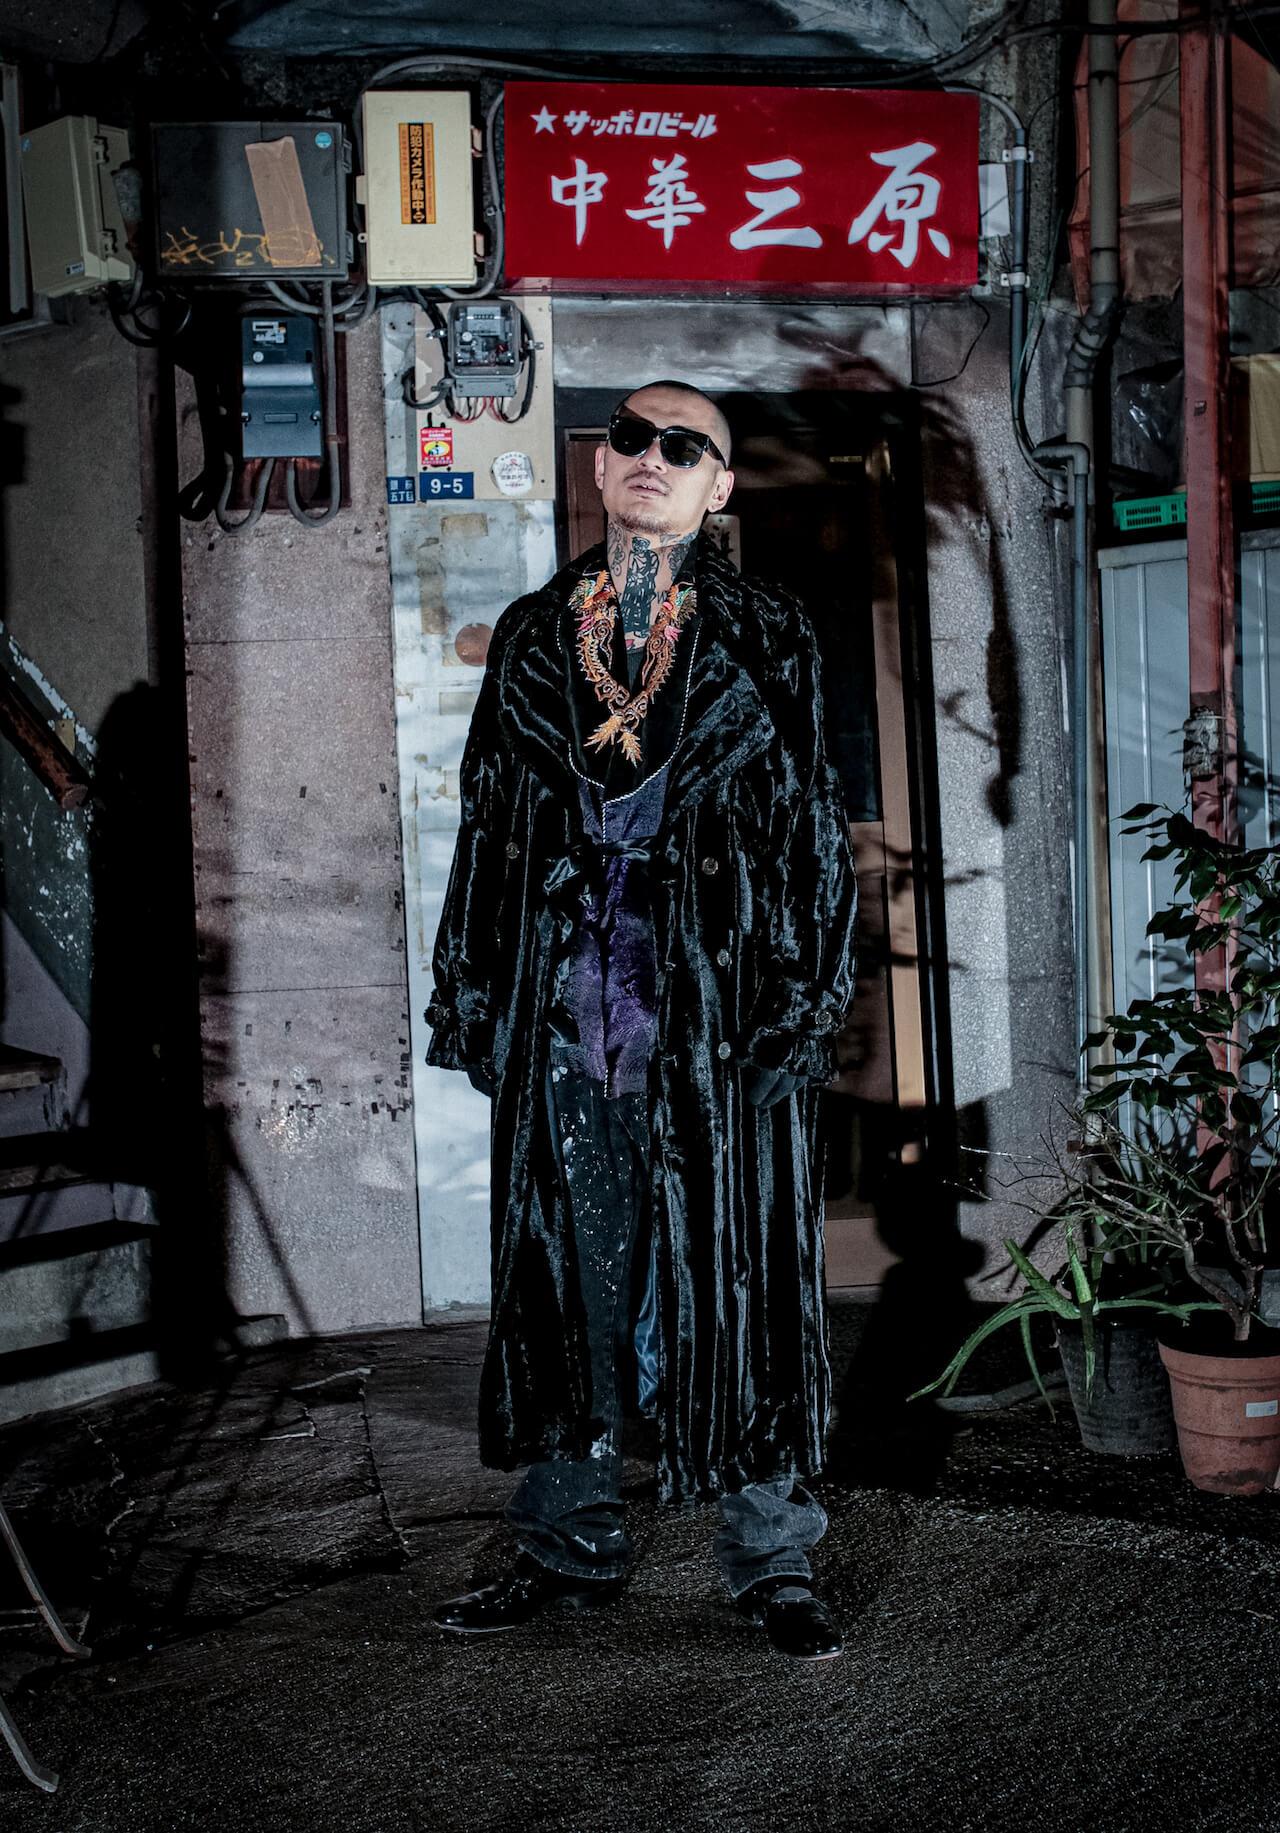 JNKMNが1stソロ・アルバム『JNKMN NOW』をリリース|BADSAIKUSH、G PLANTS、DOGMA、Awich、kZmらが参加 music200207-jnkmn-1